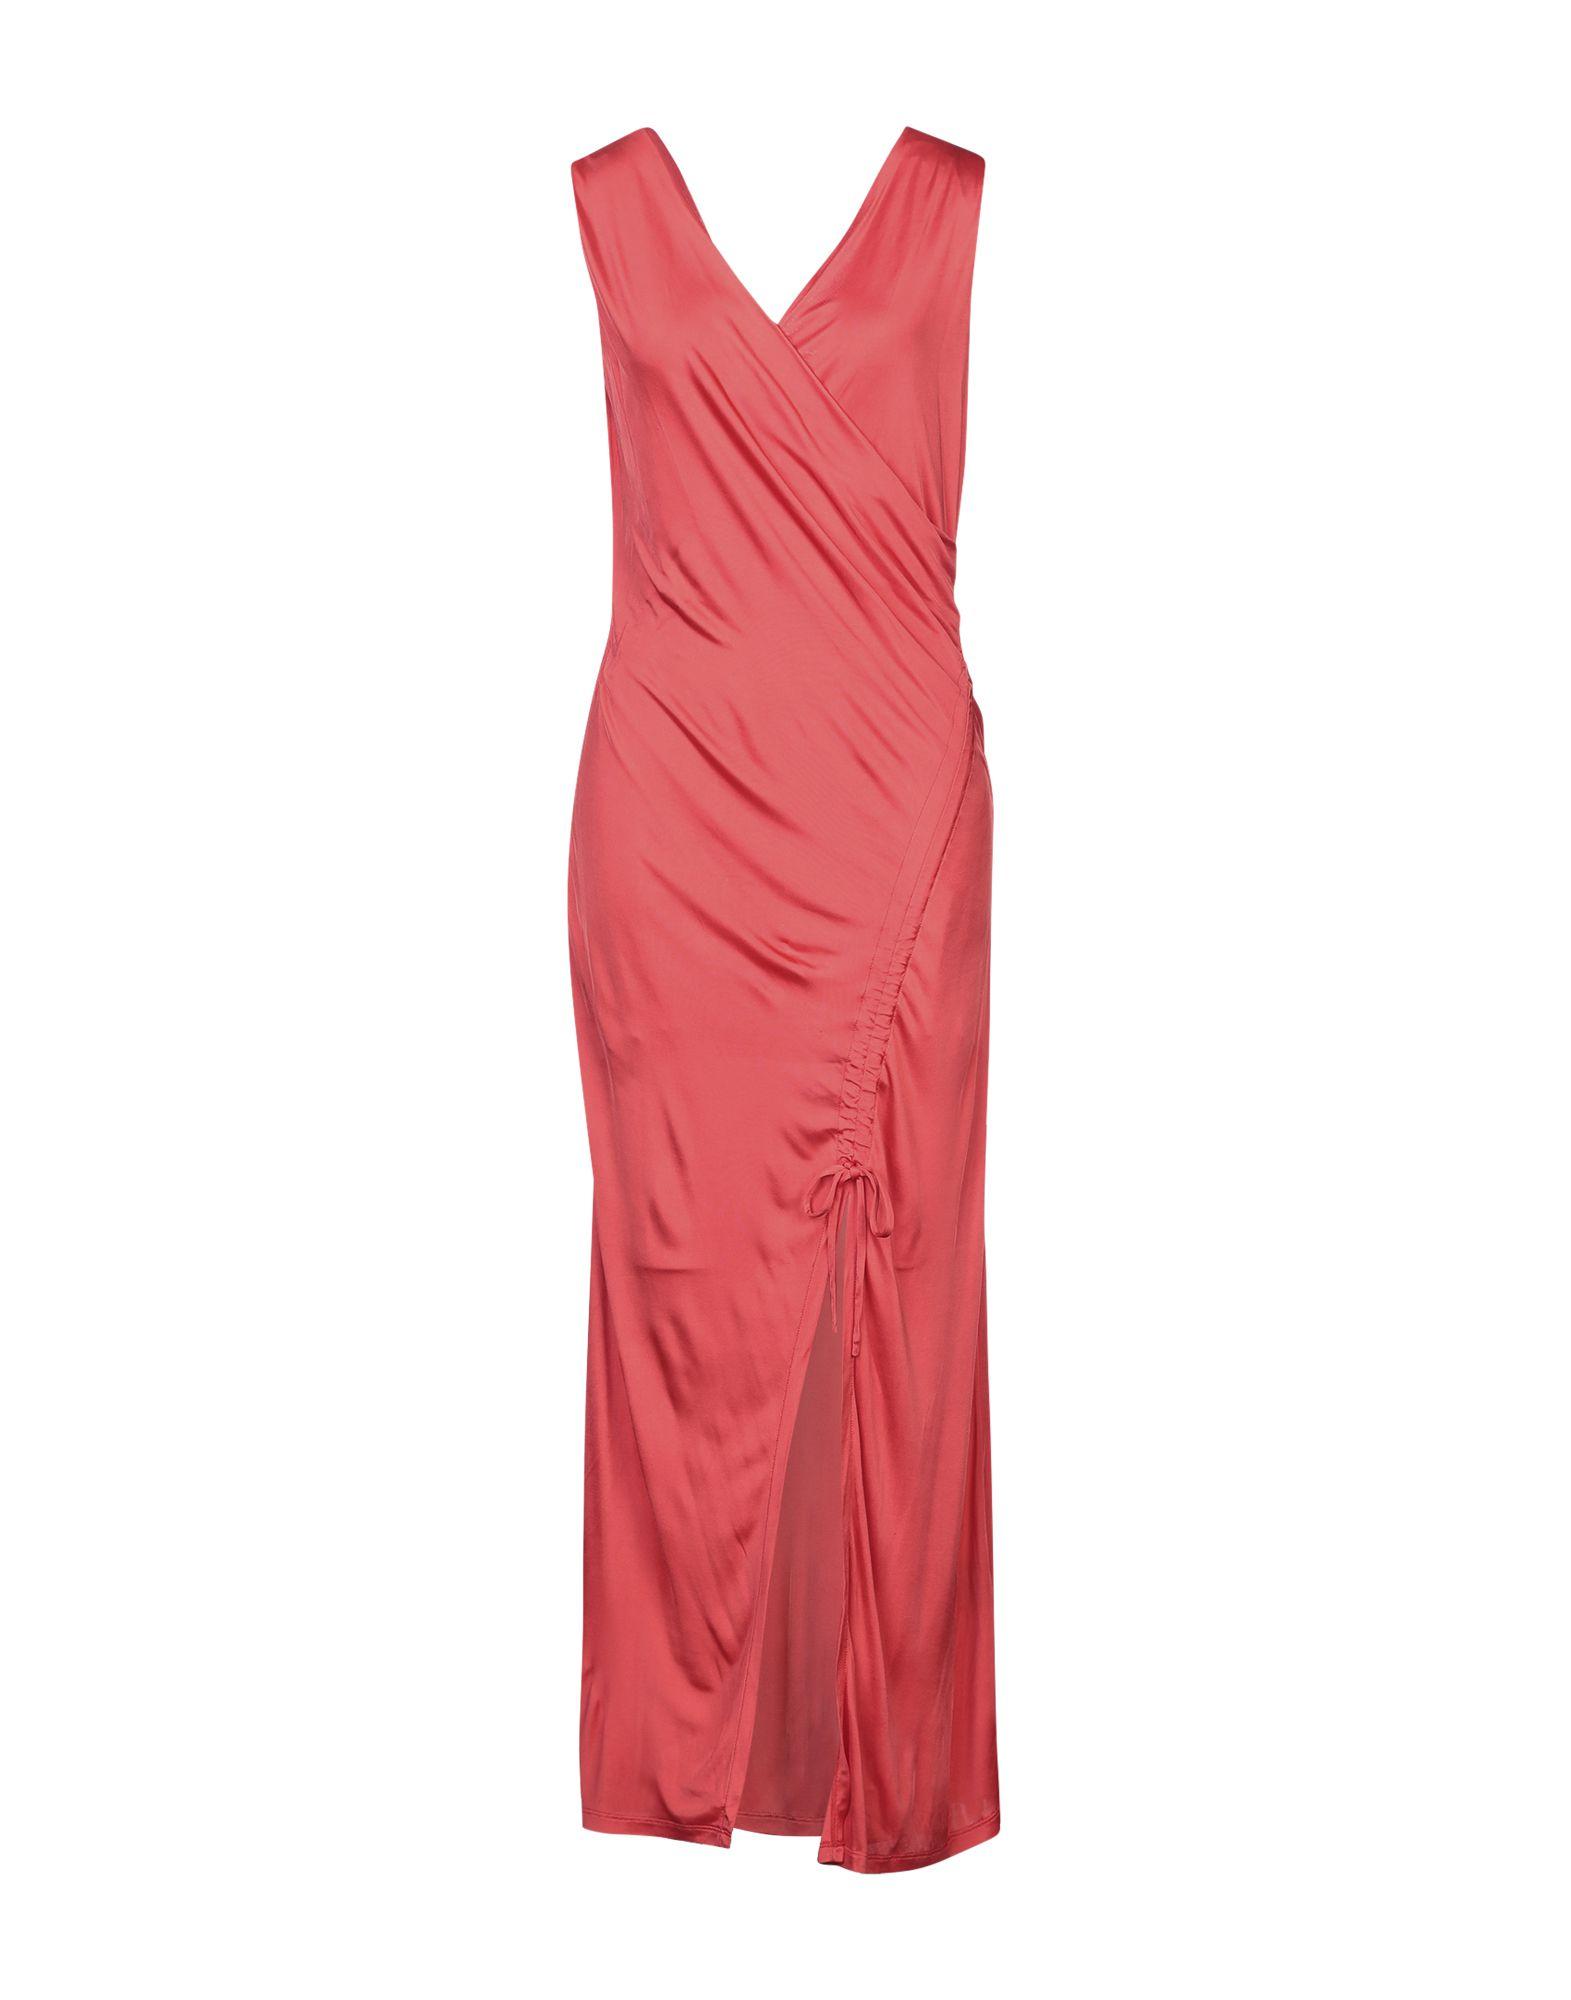 EACH X OTHER Длинное платье платье other 2015 sophia christina